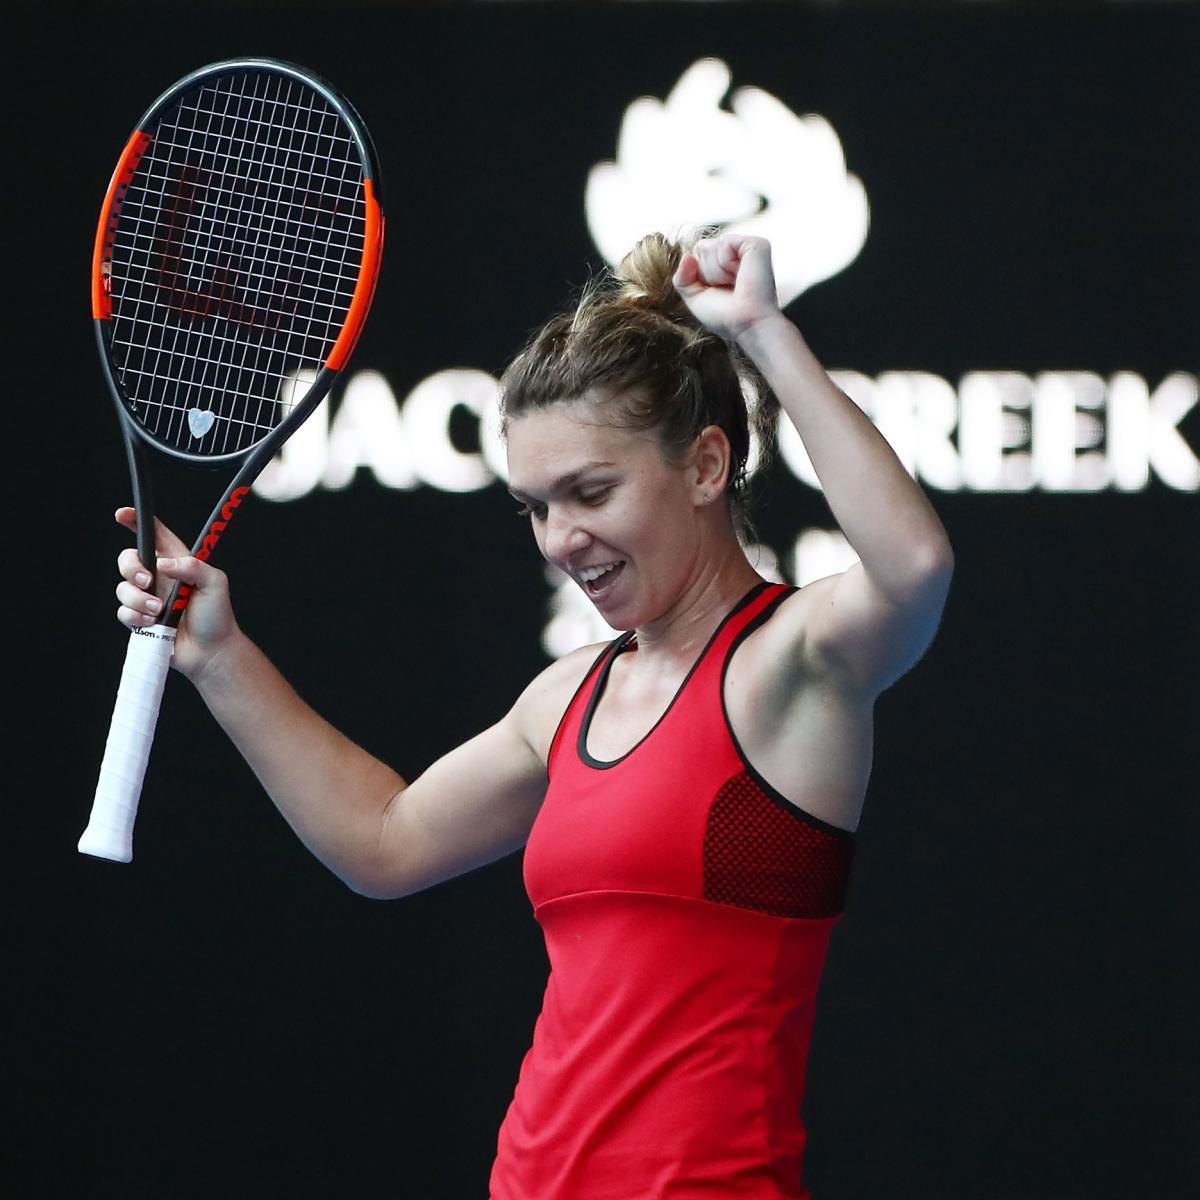 Australian Open 2018 Women's Final: TV Schedule, Start